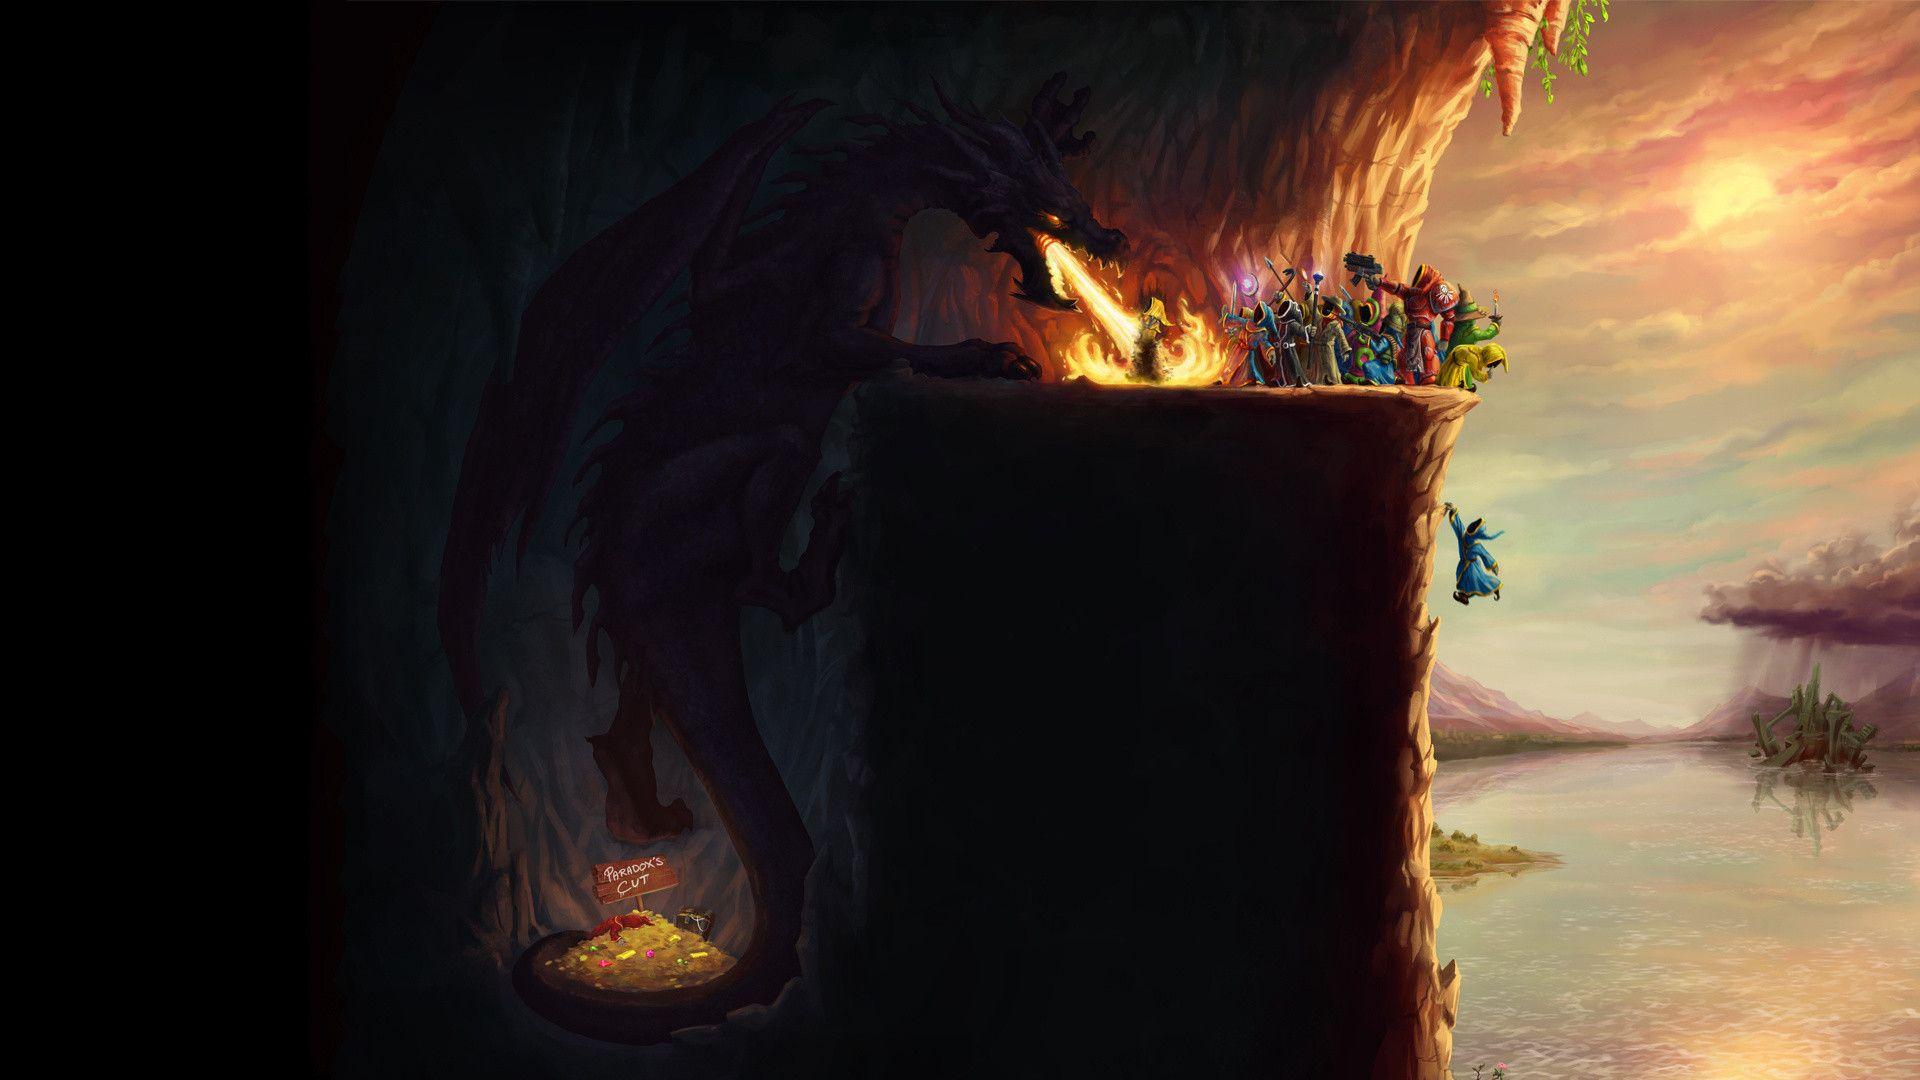 dragon image hd